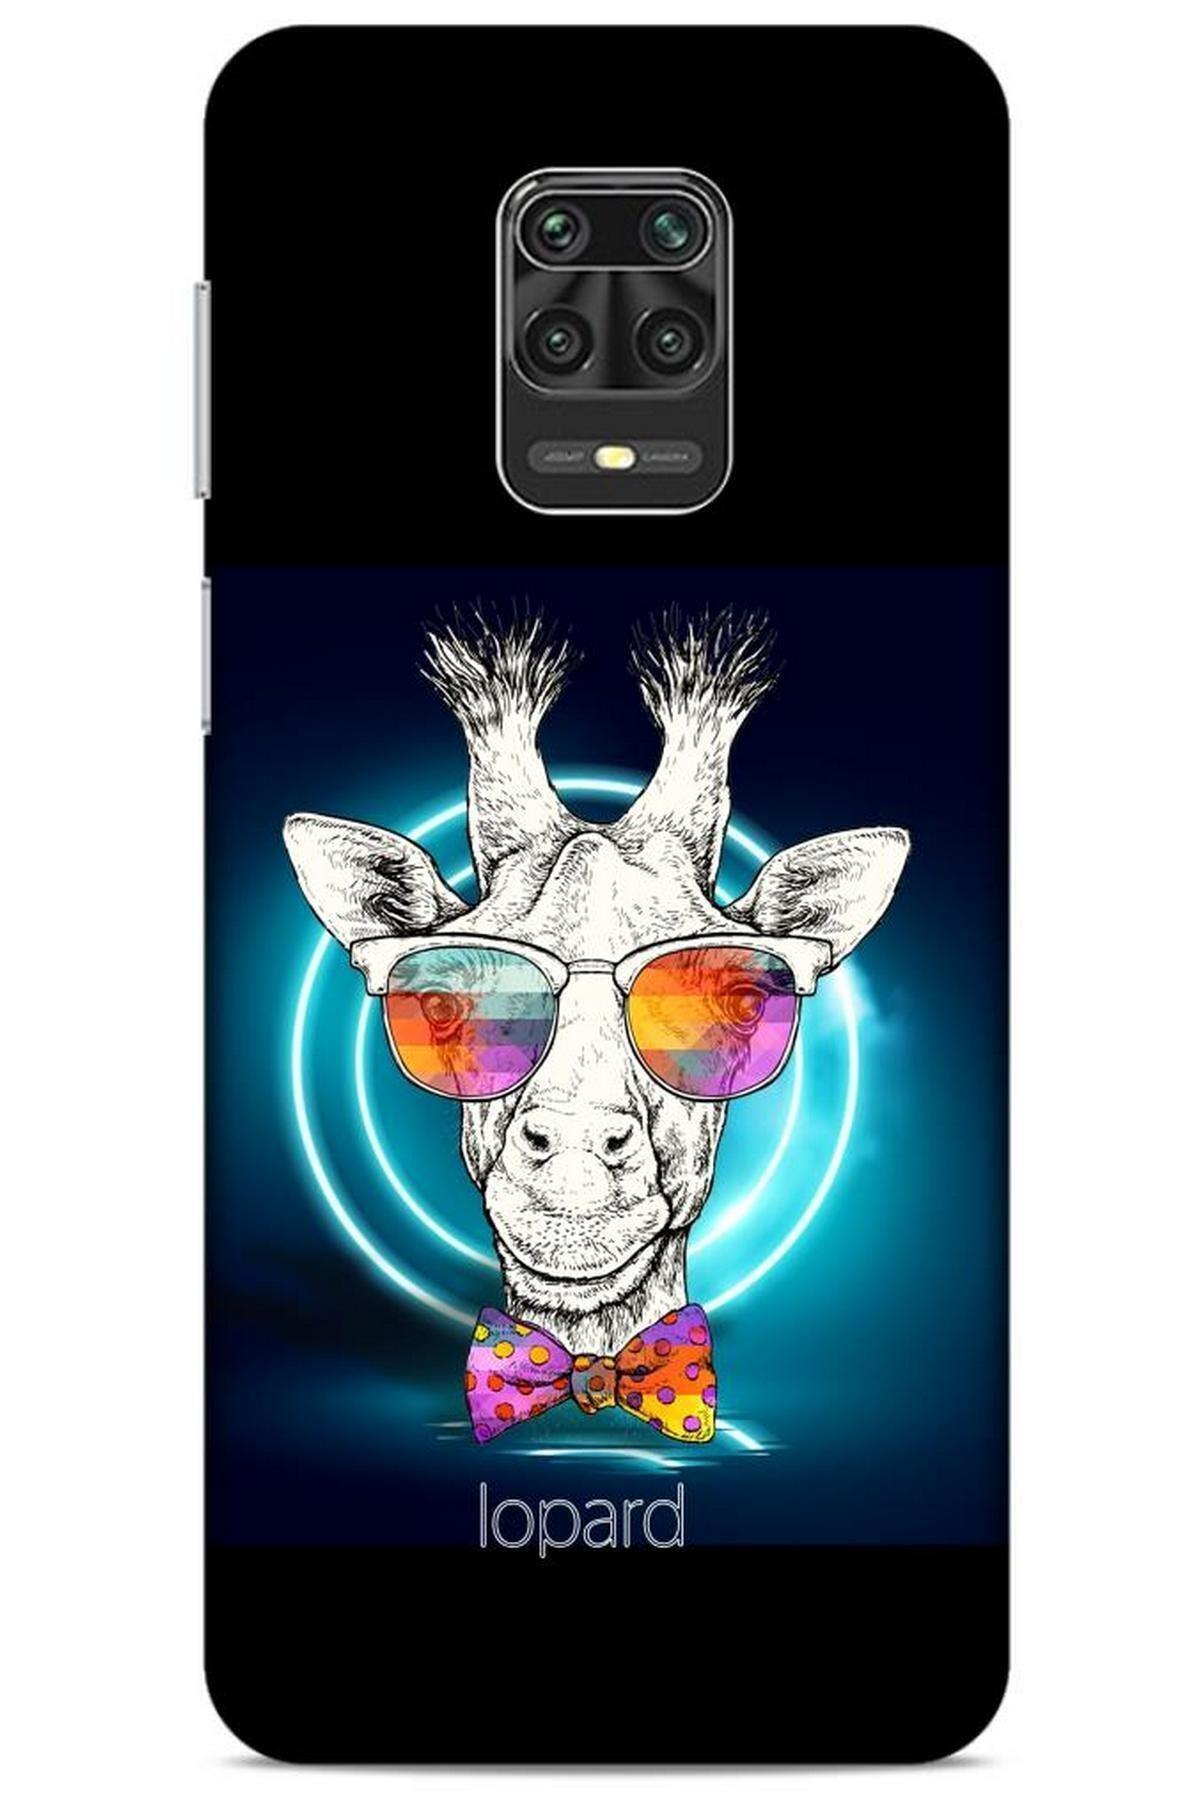 Lopard Xiaomi Redmi Note 9 Pro Kılıf Funnymax (6) Silikon Kılıf Siyah Zürafa 1